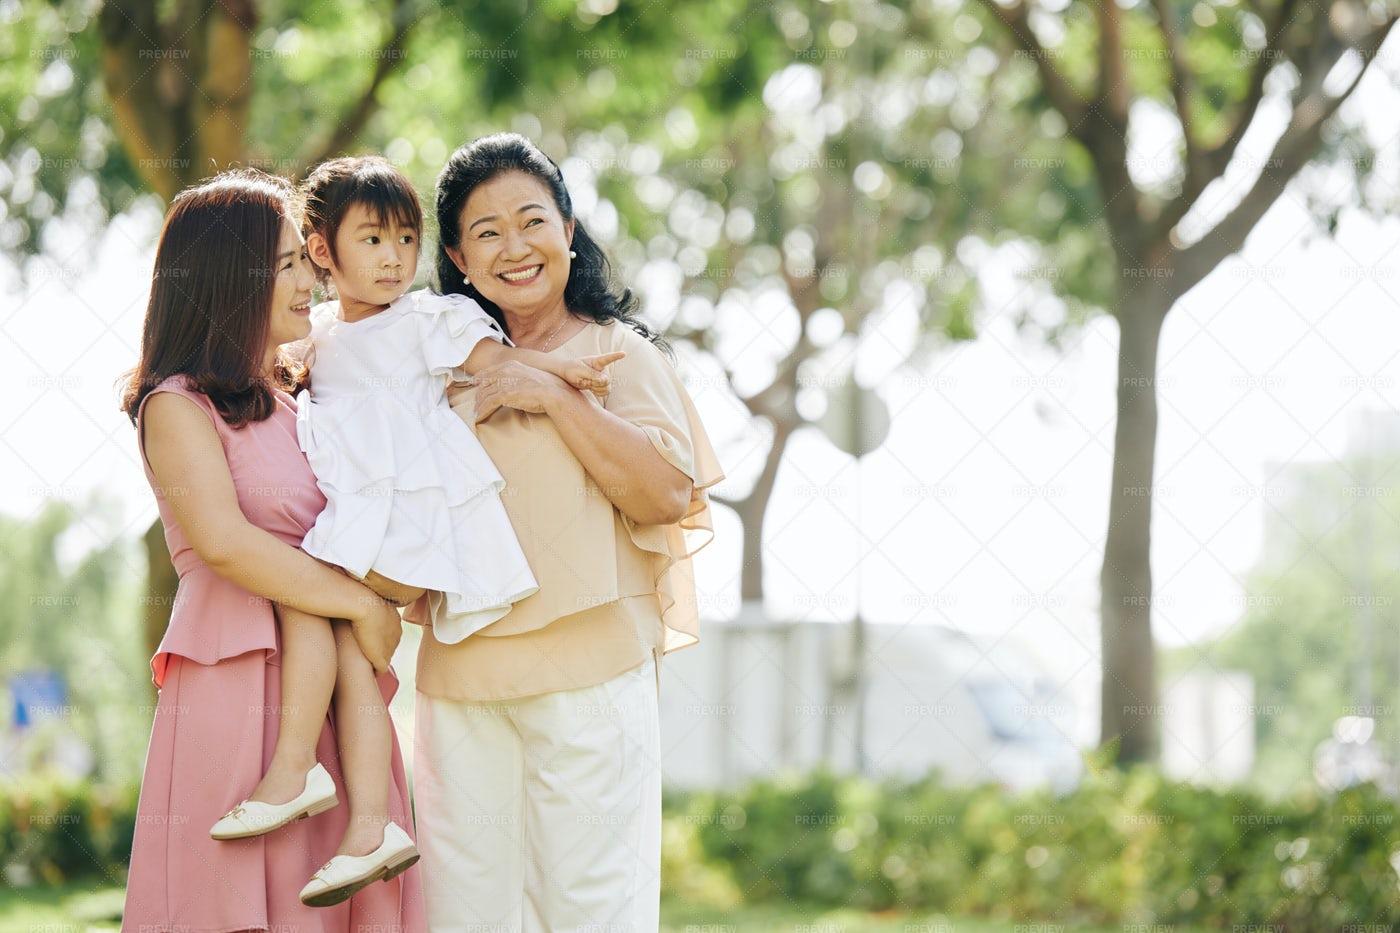 Family Enjoying Walk In The Park: Stock Photos